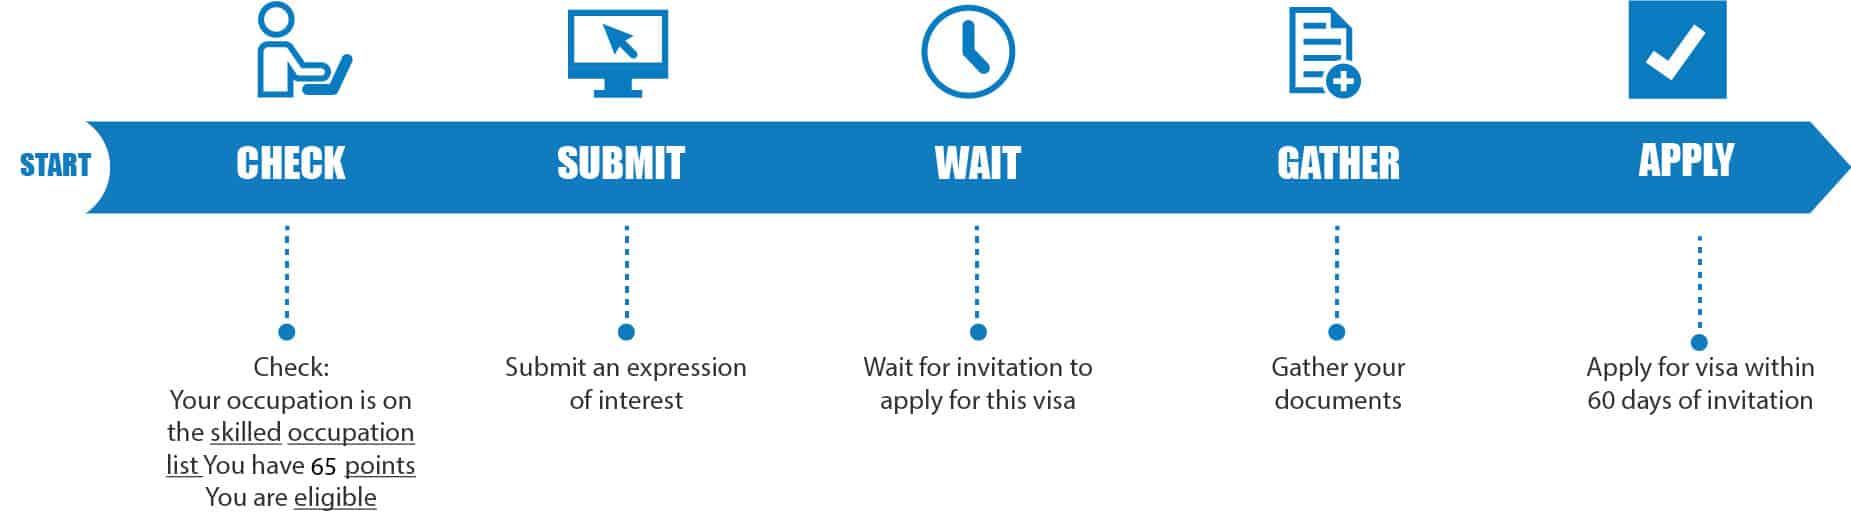 Usa Family Visa Processing Time